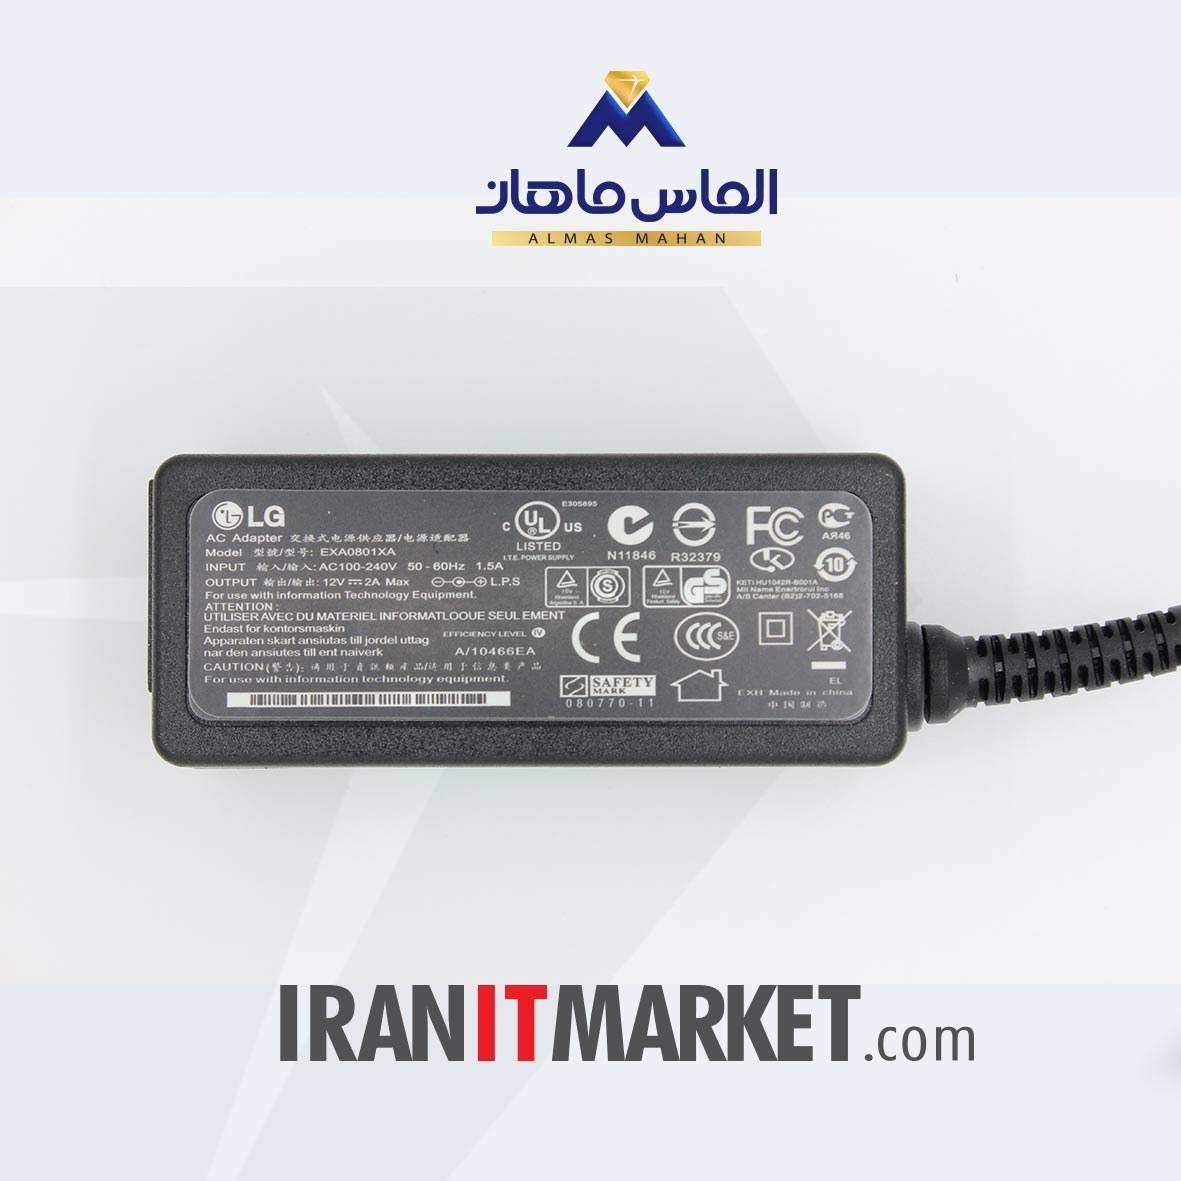 تصویر آداپتور و شارژر مانیتور ال جی Adaptor monitor lg 19v 1.7a